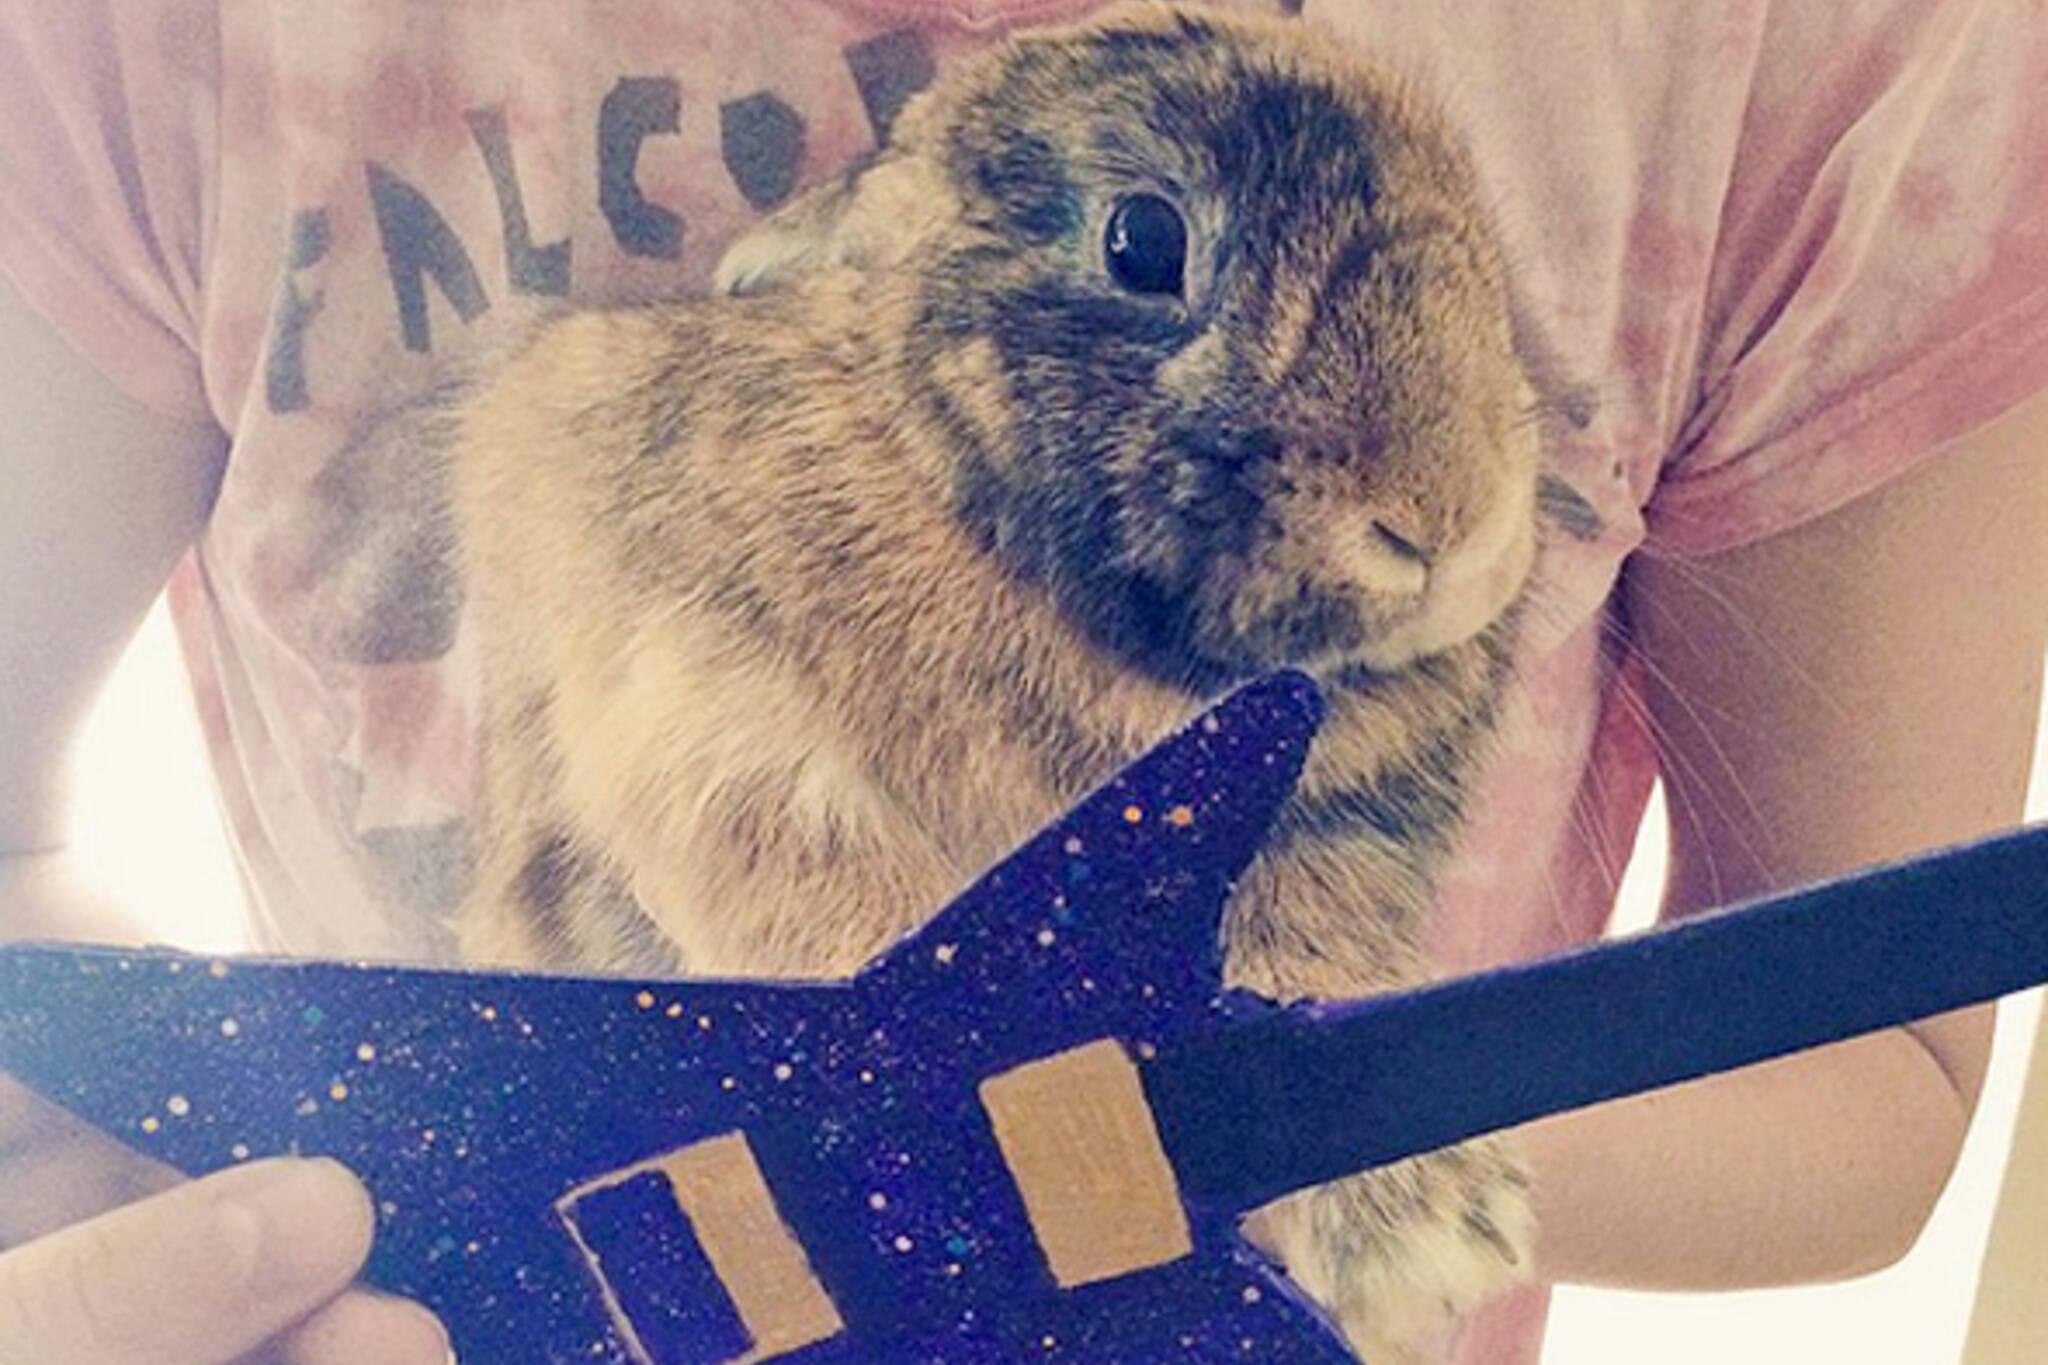 Bunnies Toronto Twitter